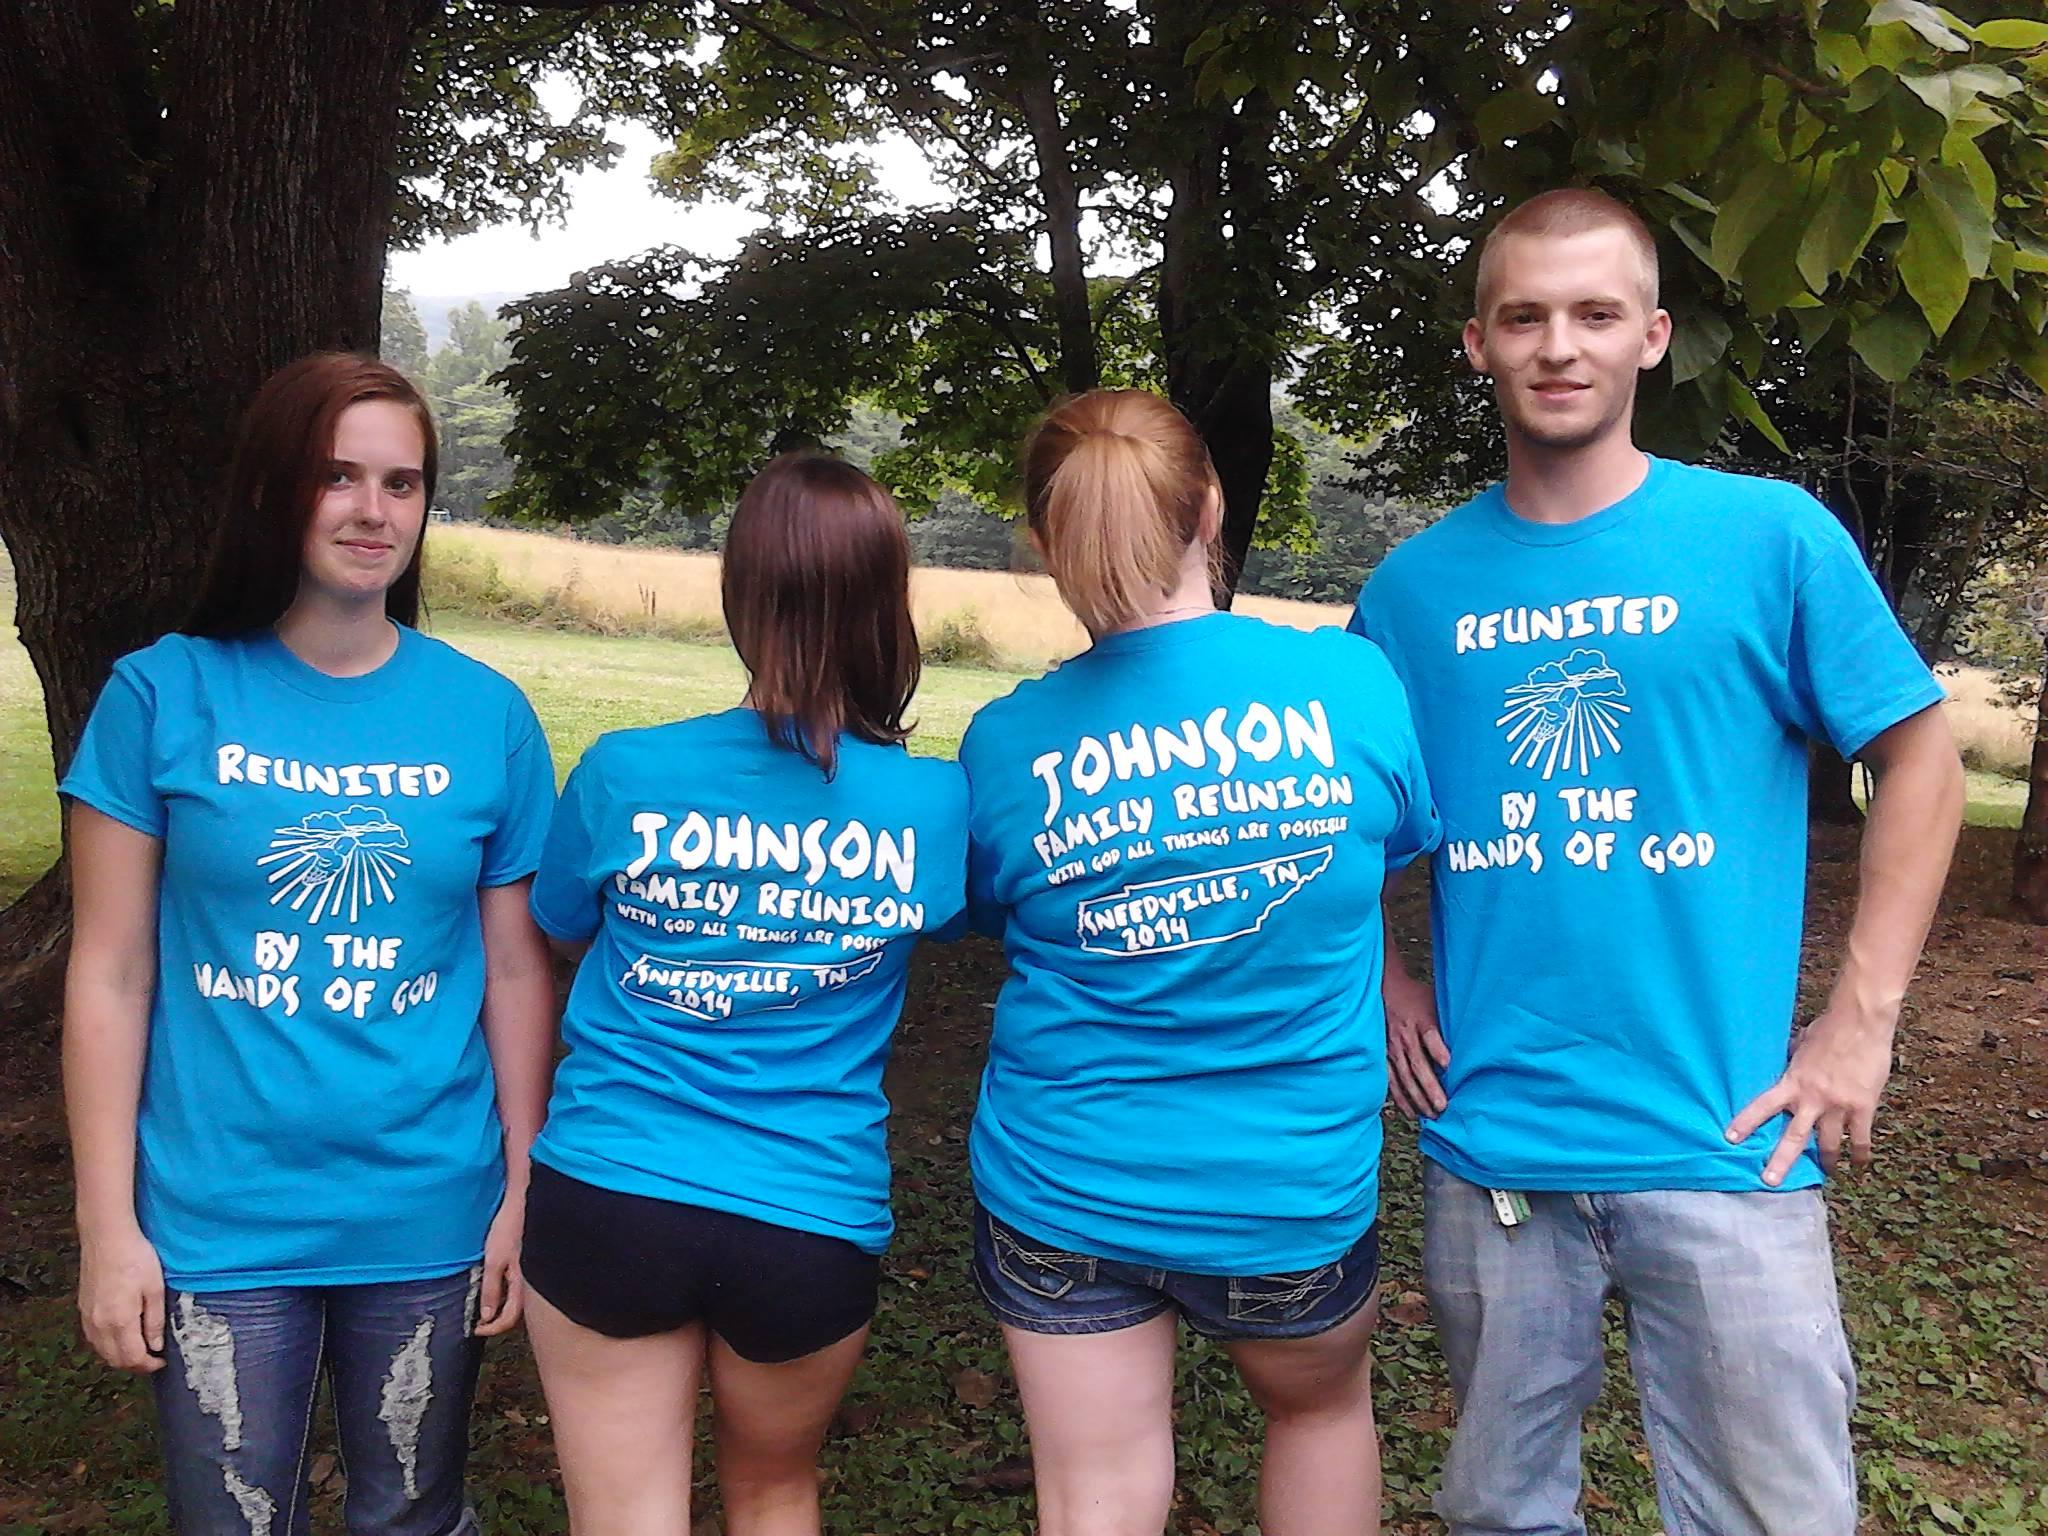 Johnson family reunion t shirt photo